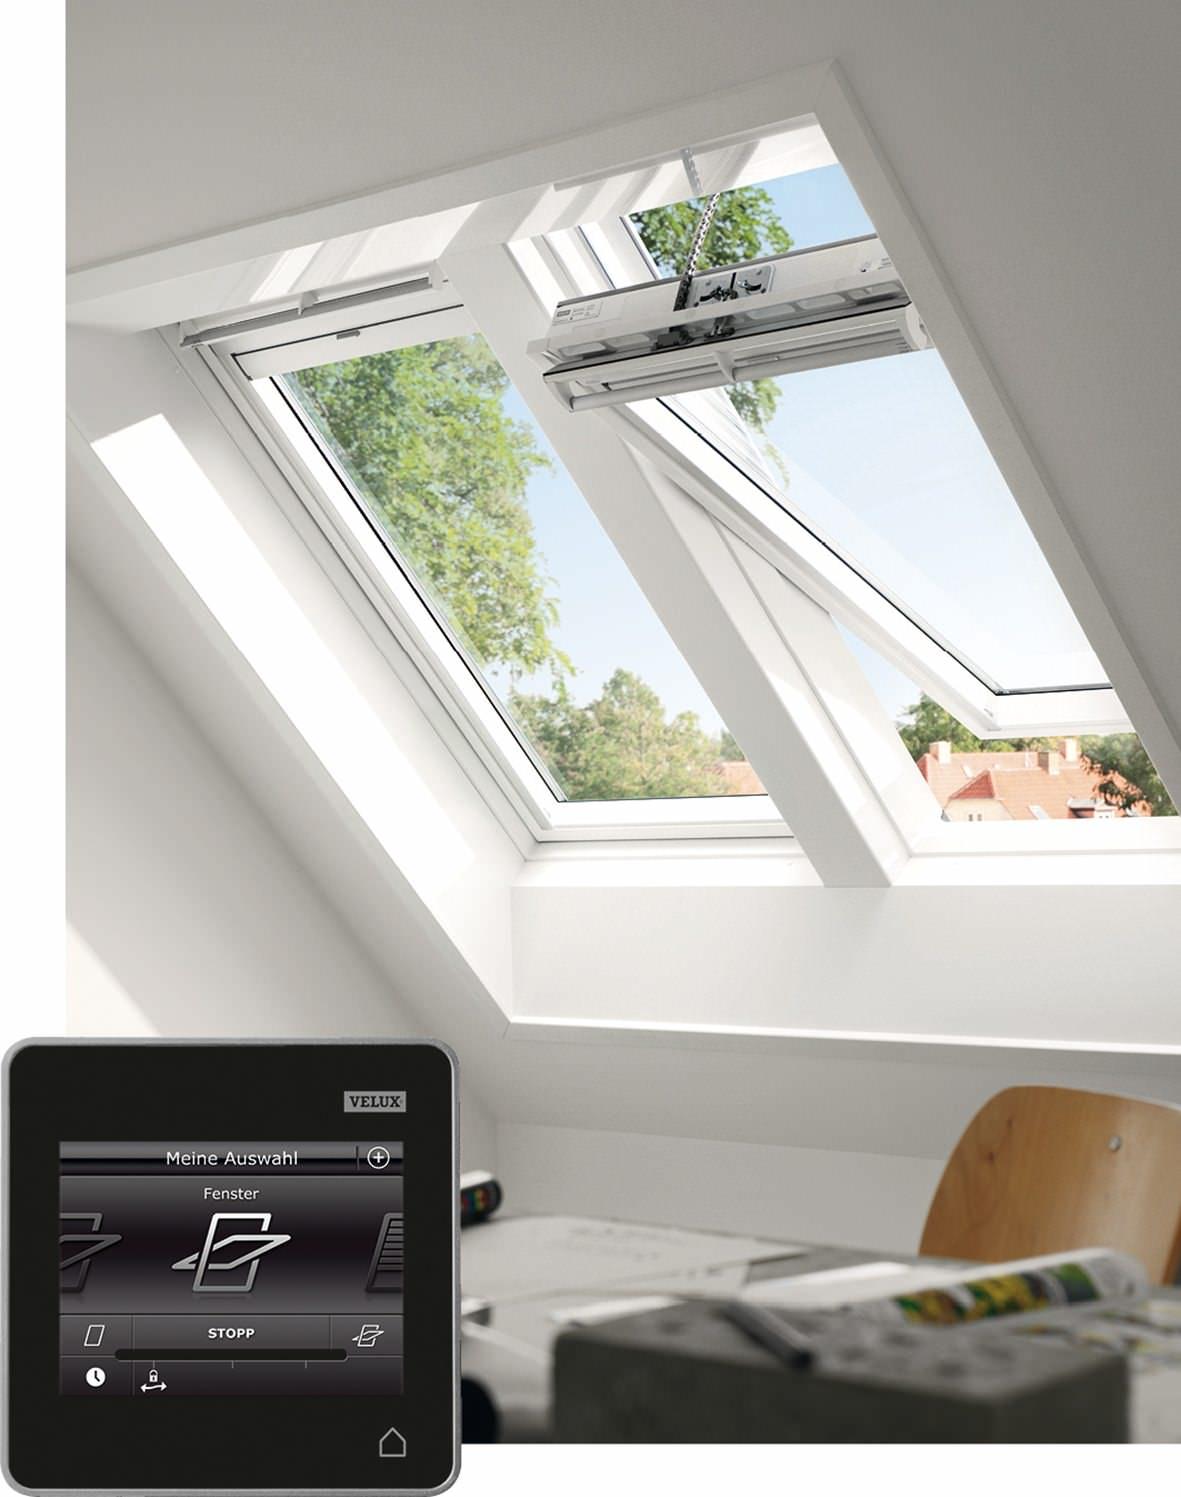 velux dachfenster ggu sd0j230 kunststoff integra solarfenster thermo plus aluminium. Black Bedroom Furniture Sets. Home Design Ideas